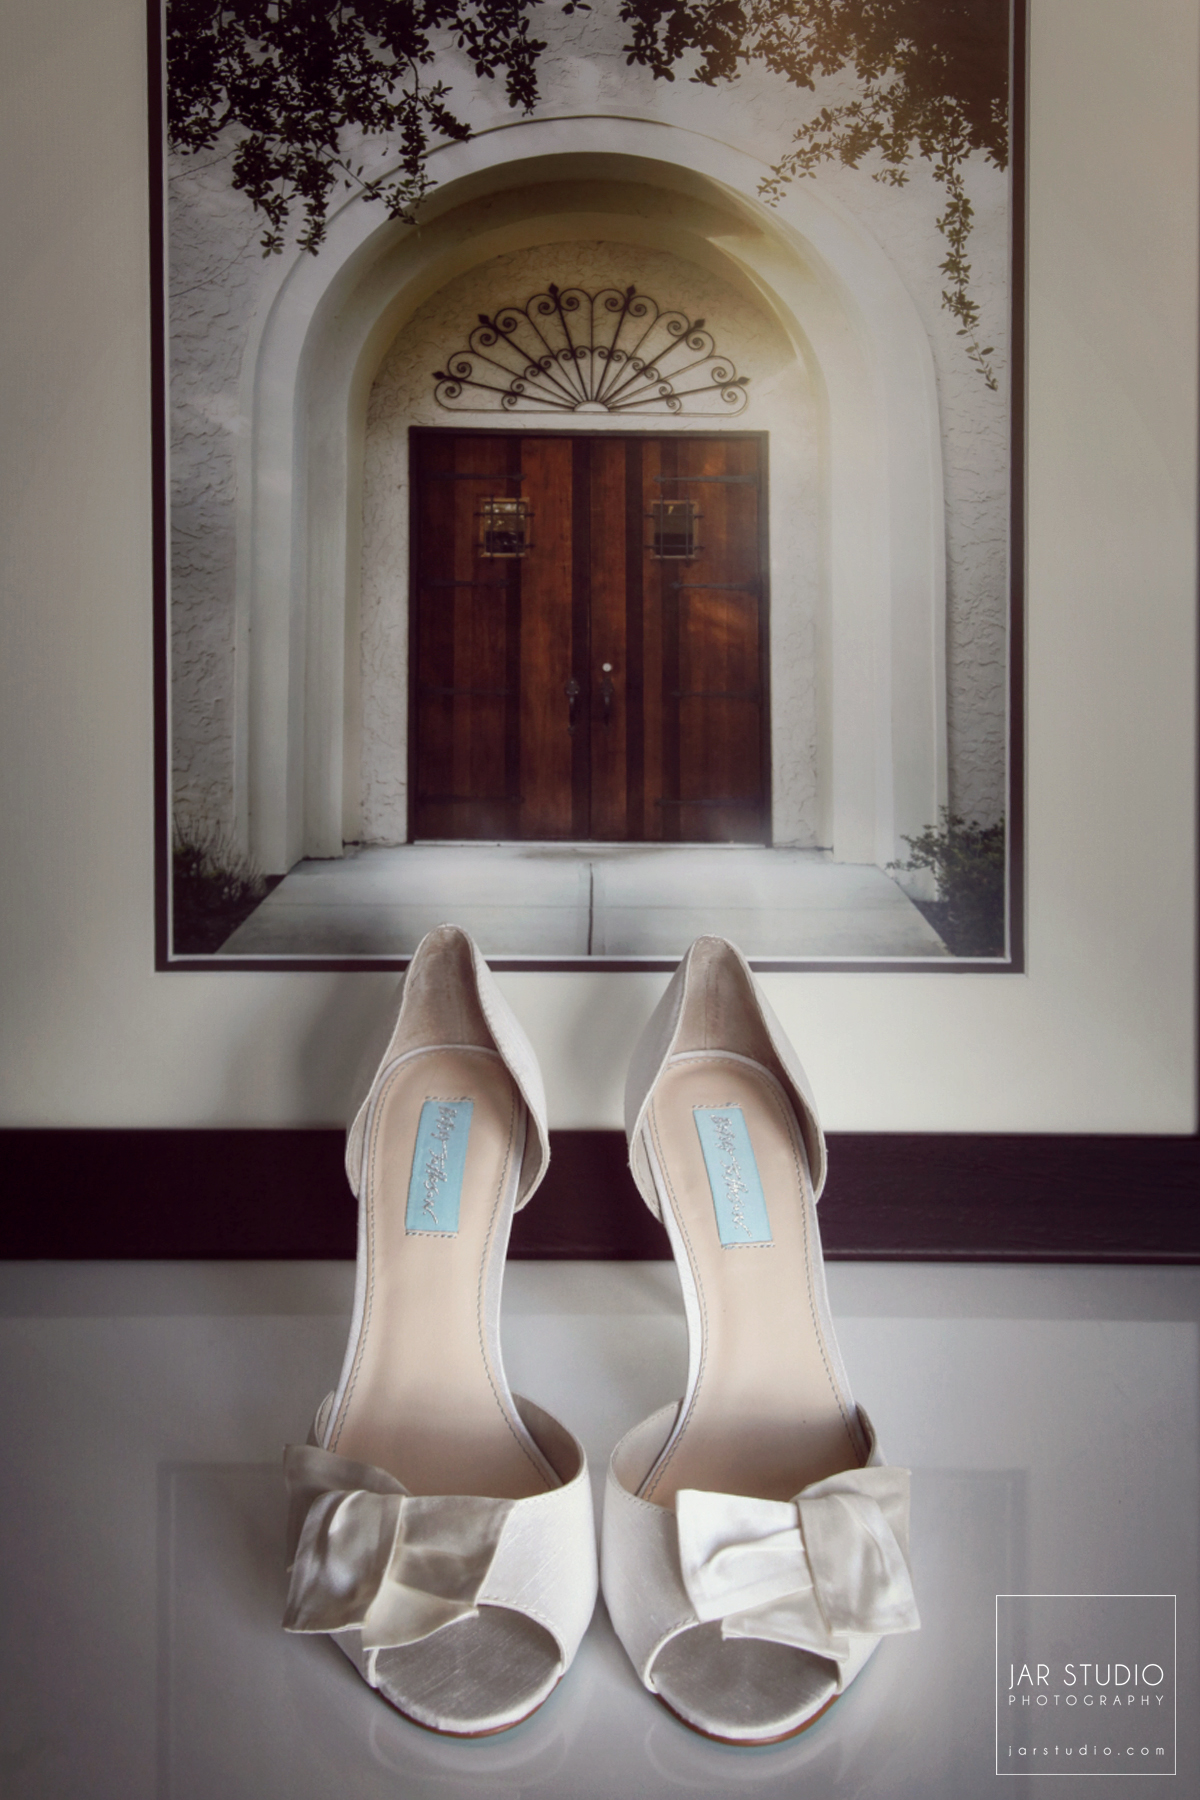 04-wedding-shoes-rollins-alfond-inn-jarstudio-photography.JPG